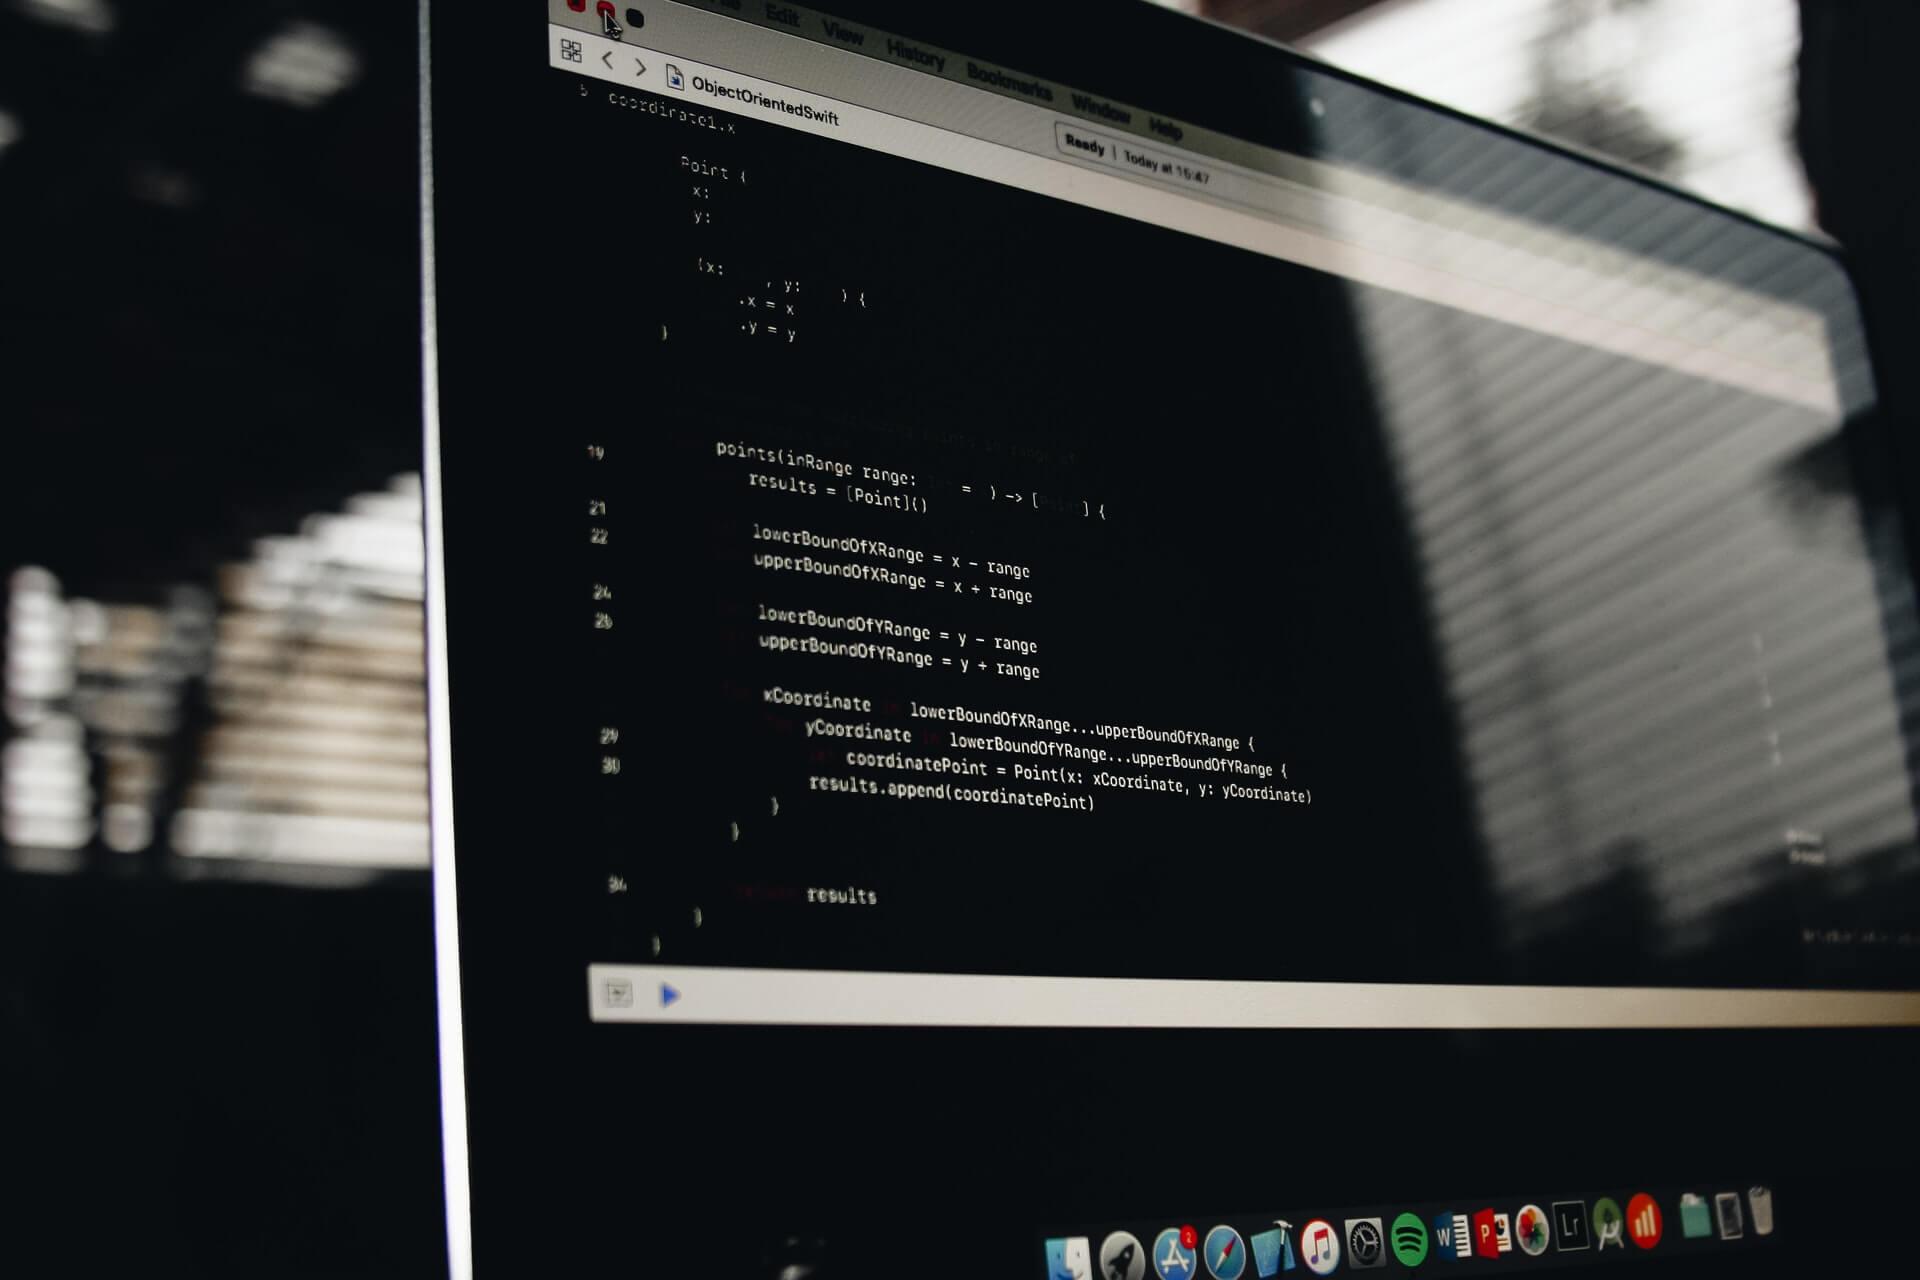 Slows down a computer - Program